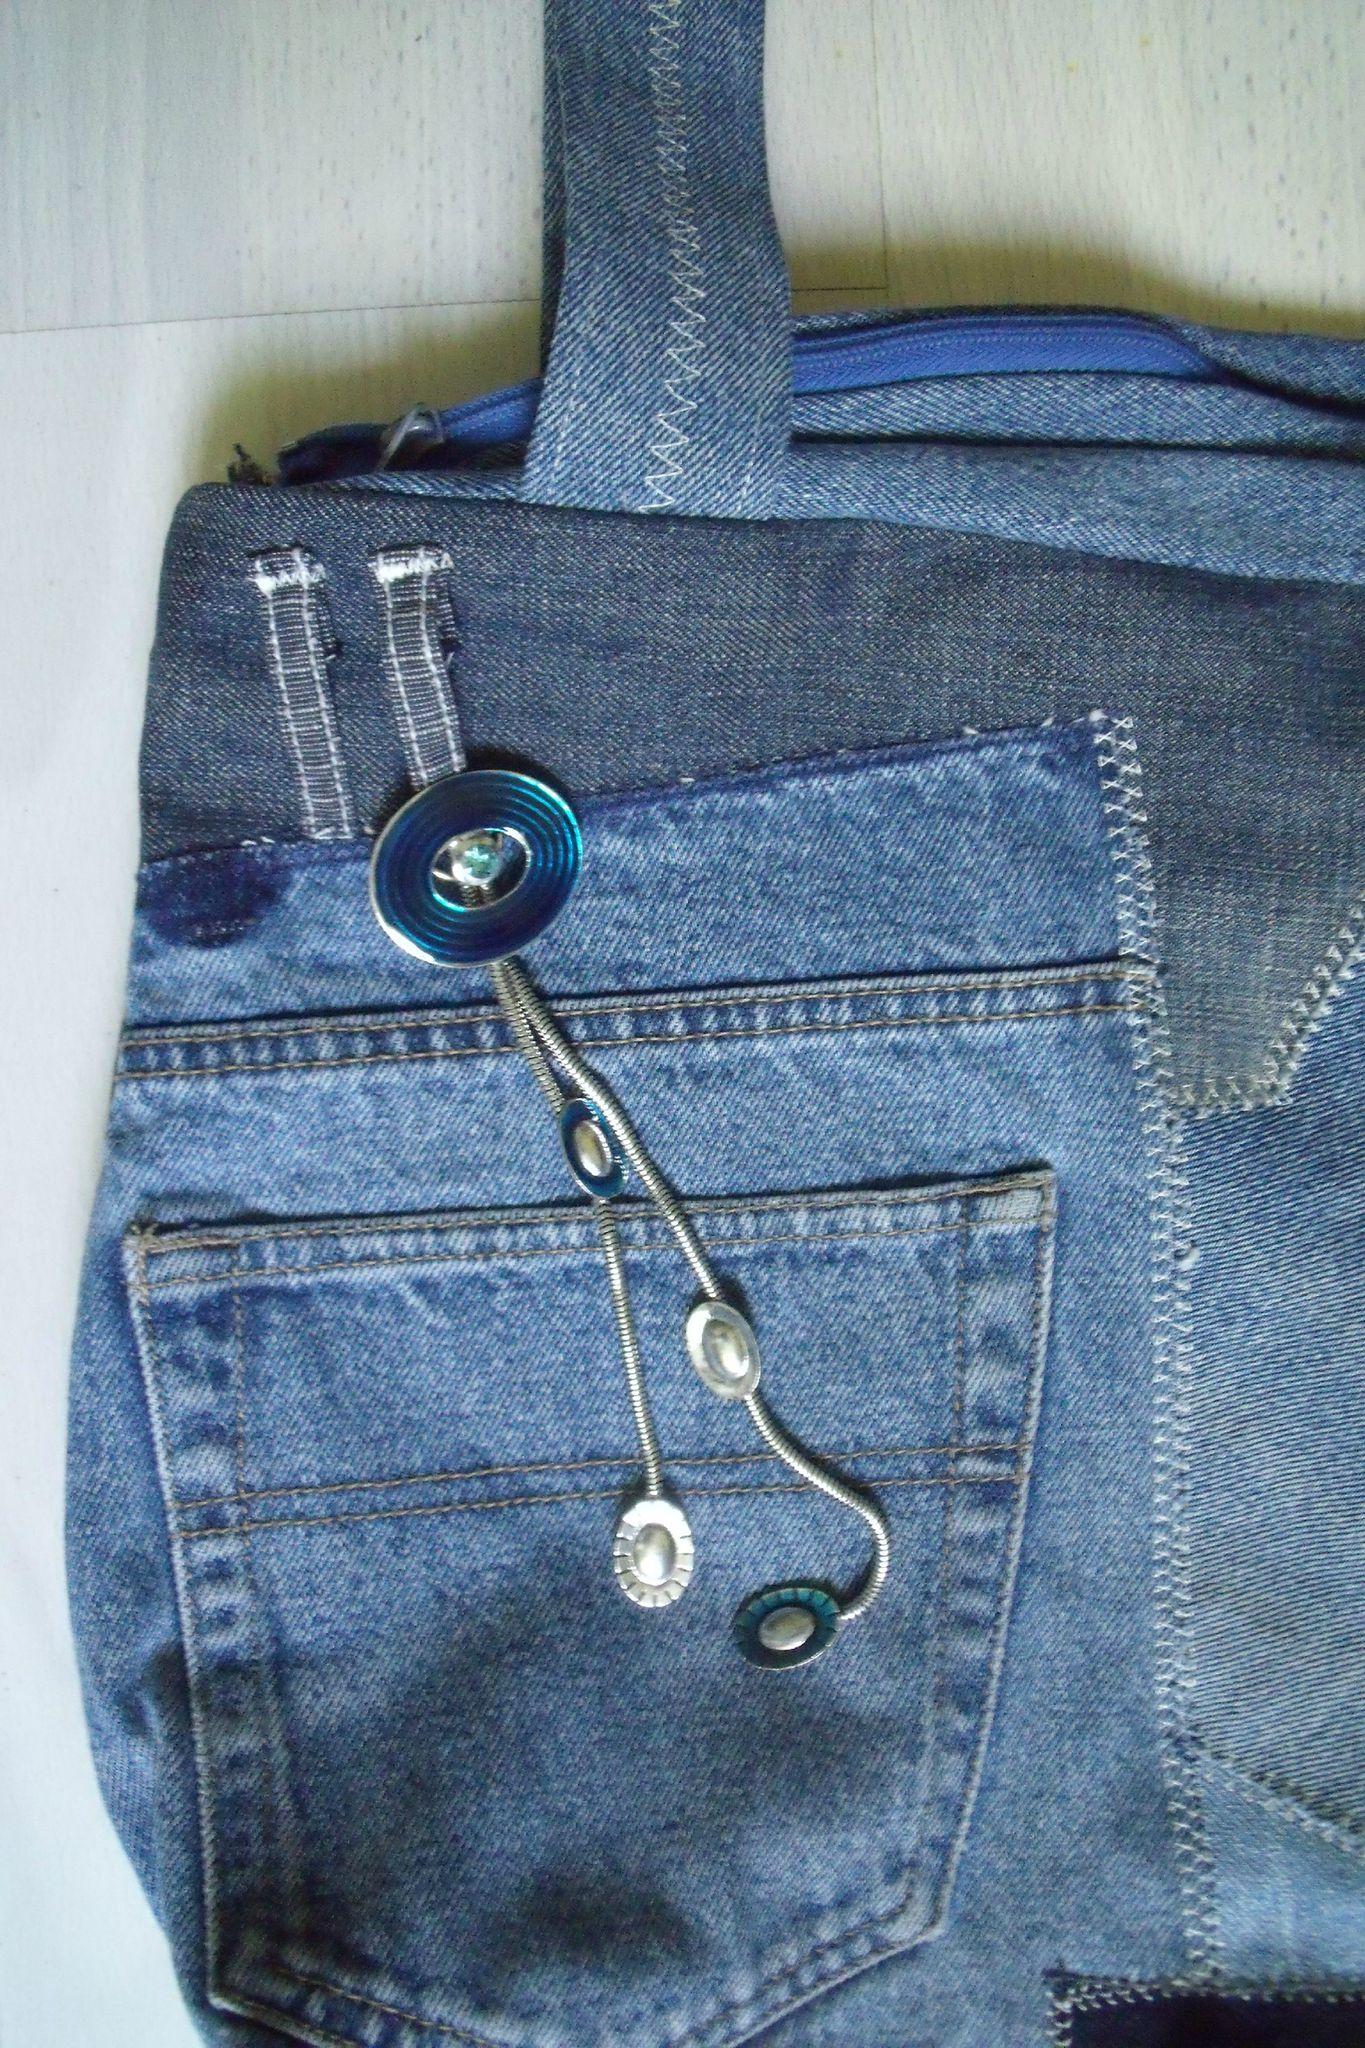 sac jeans 3 detail